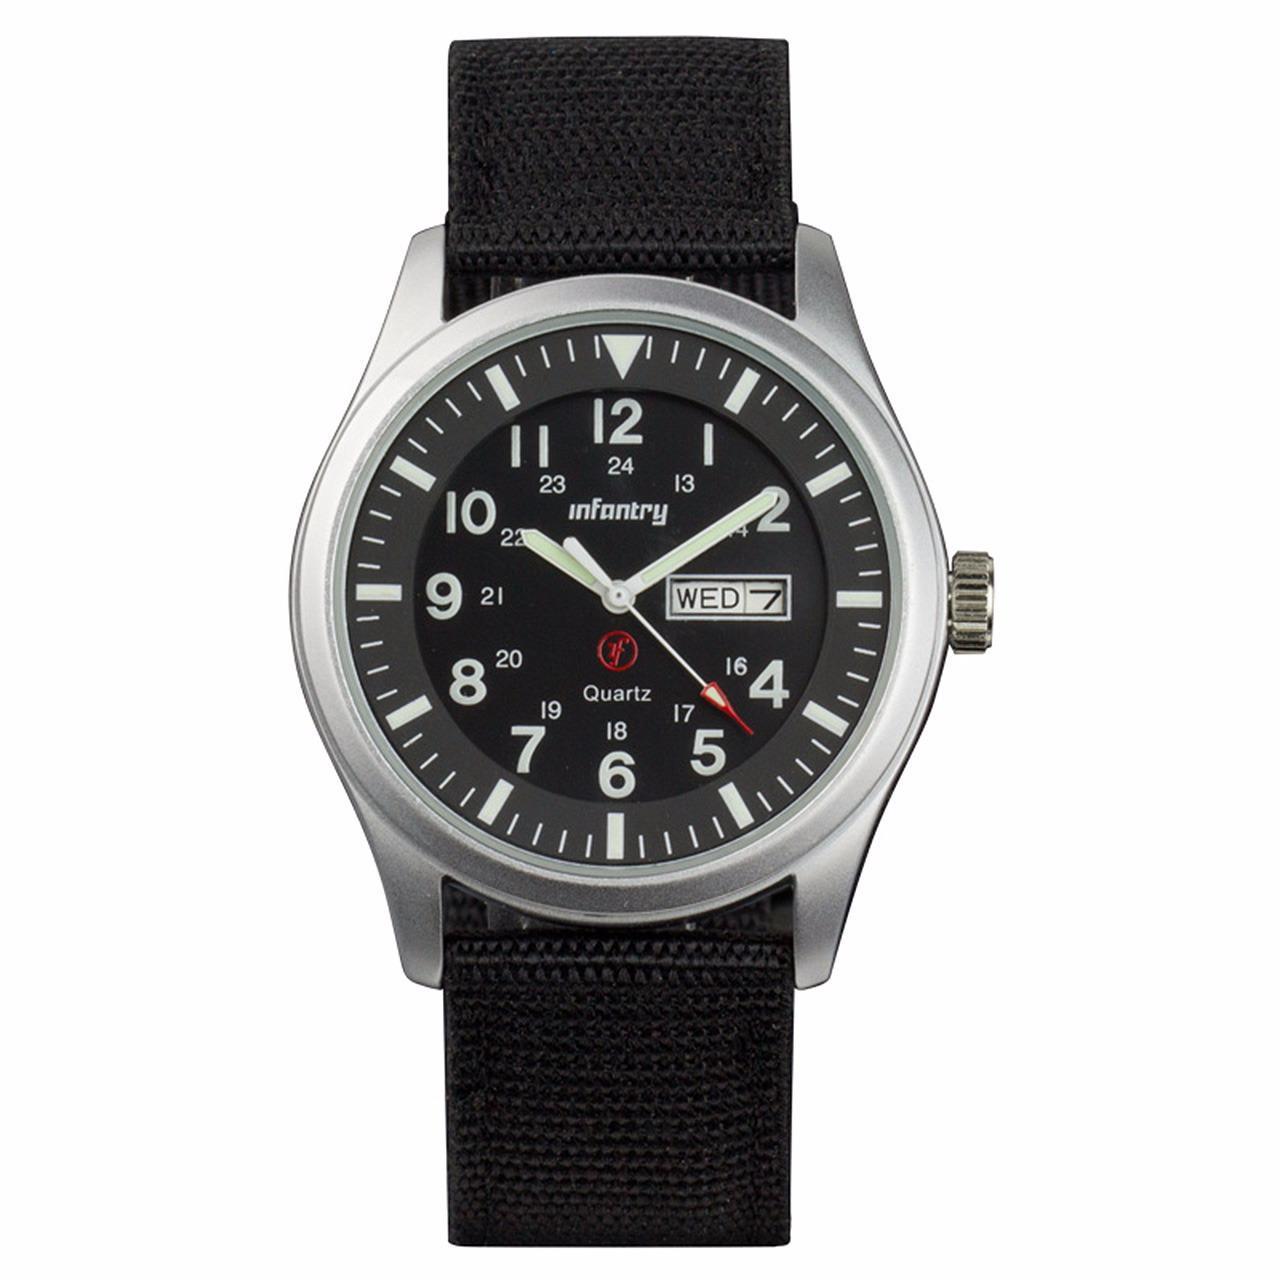 INFANTRY Mens Digital Quartz Wrist Watch Stopwatch Alarm Sport LCD Chronograph(Black)